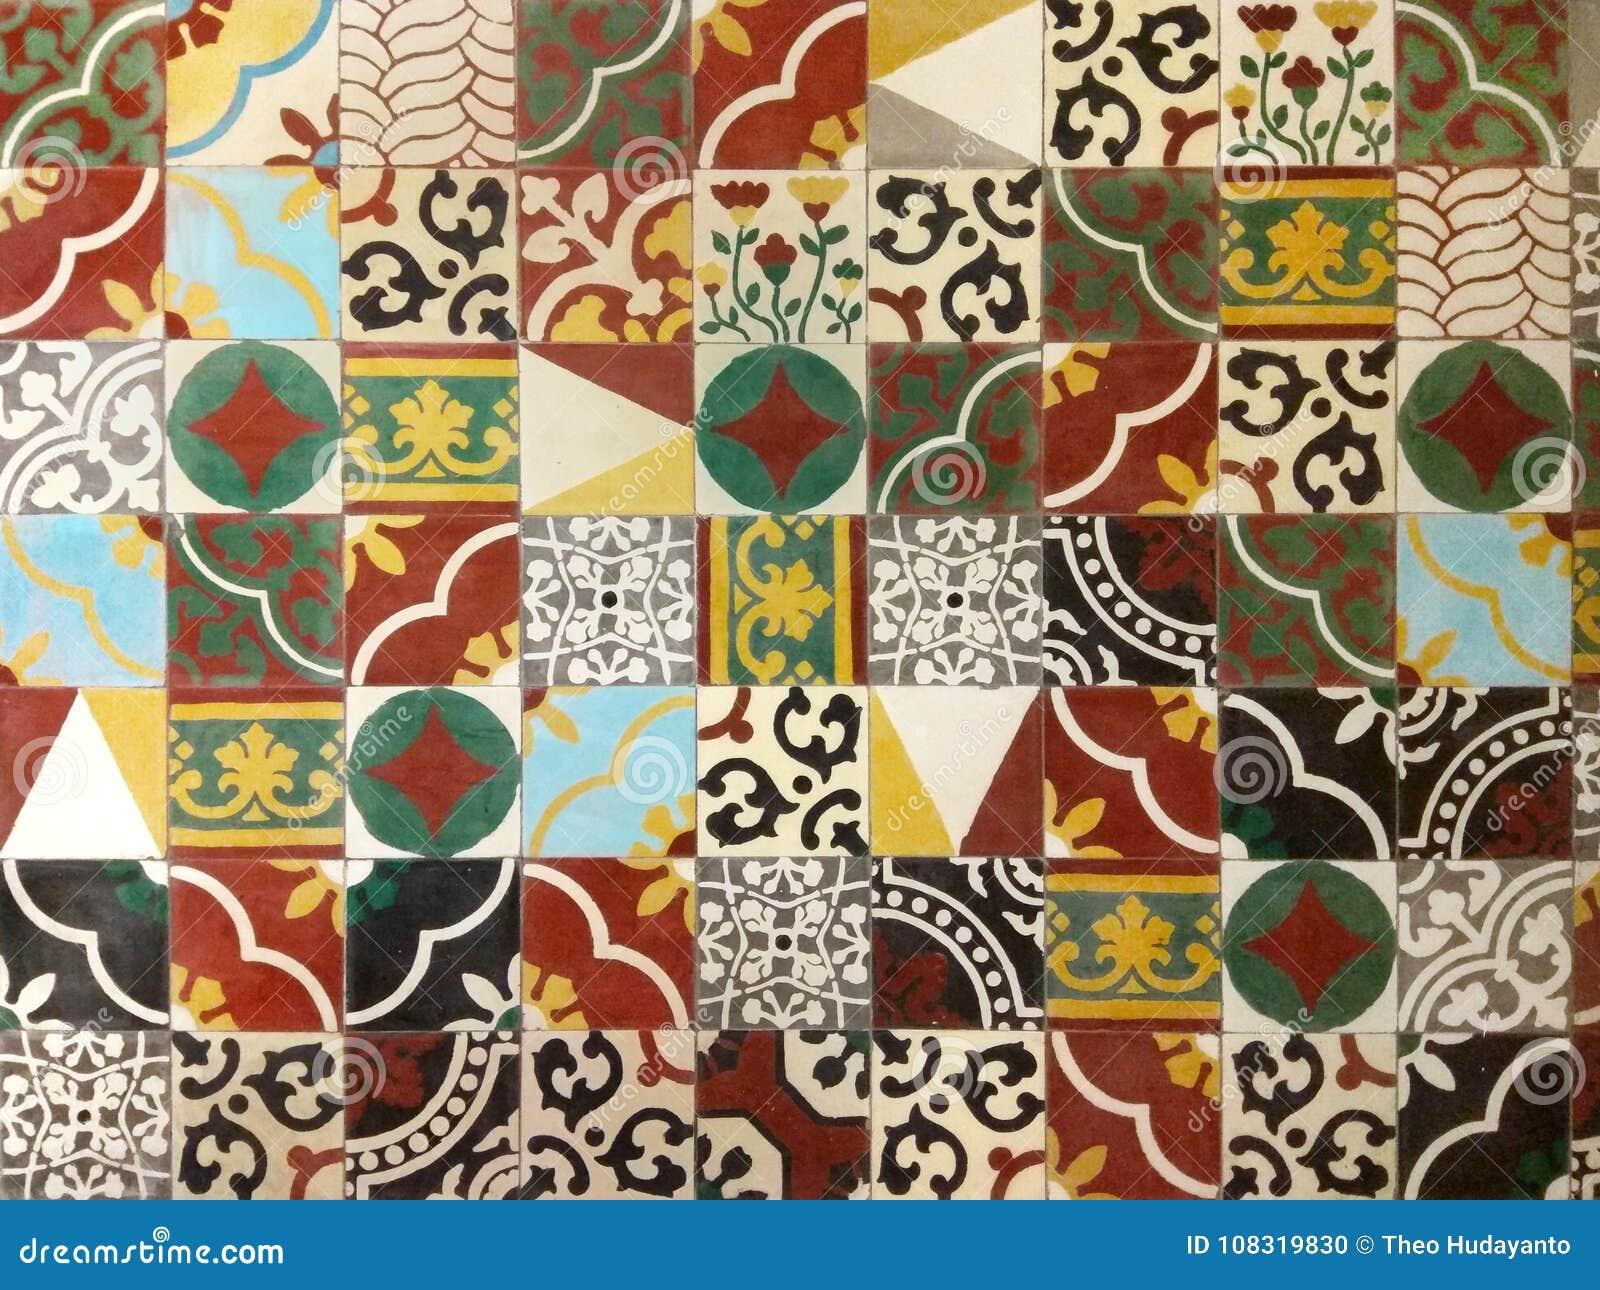 Ethnic decor tiles wall stock photo. image of traditional 108319830